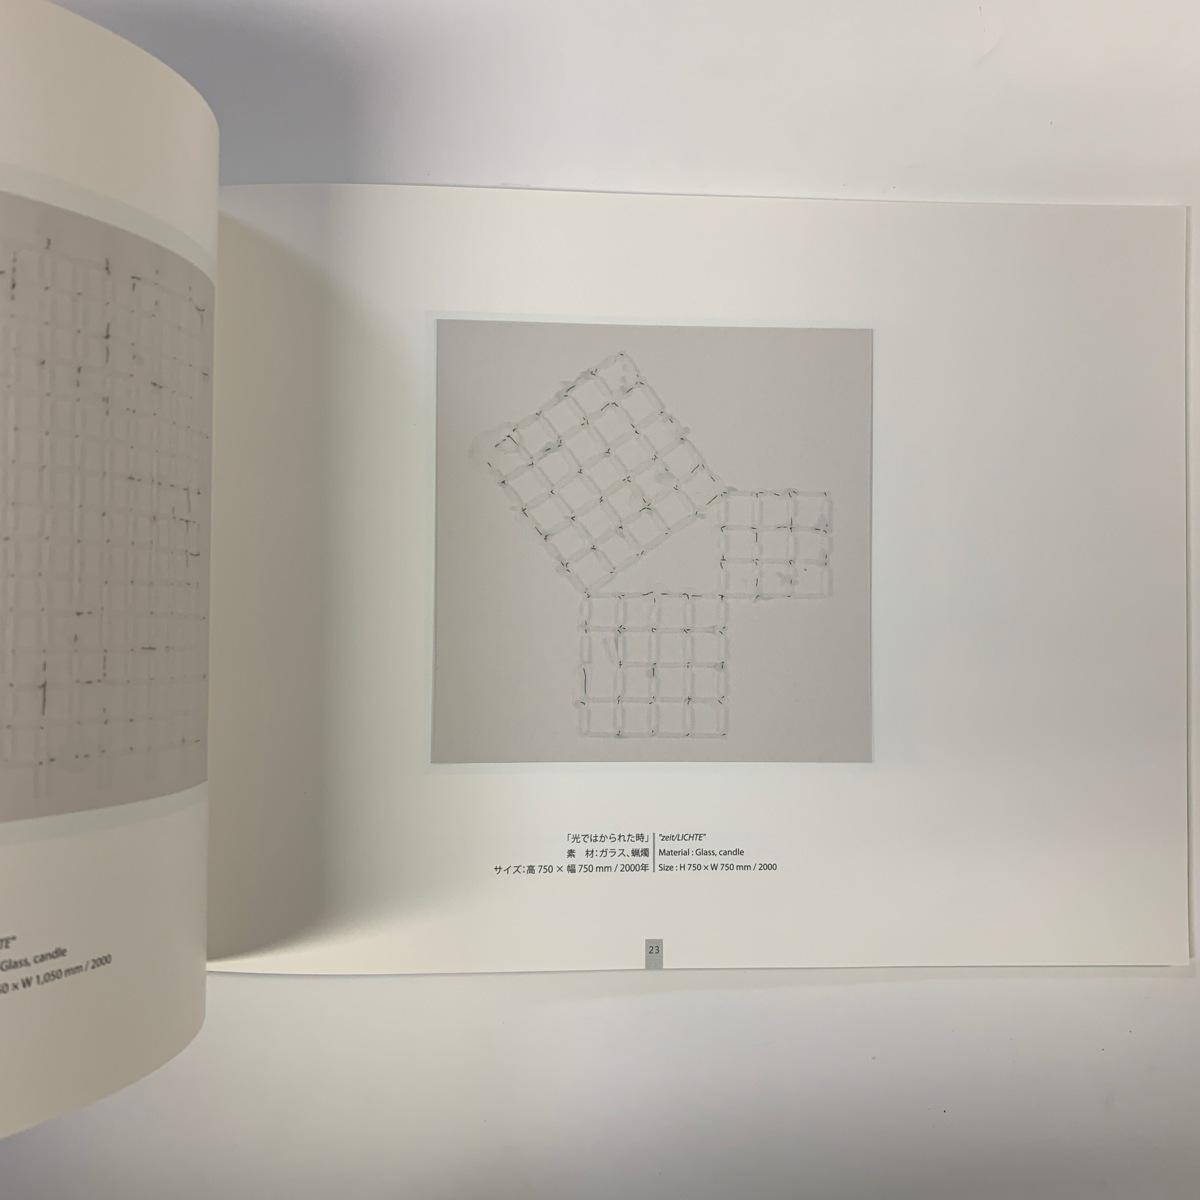 zeit / LIGHTE 渡辺好明遺作展 光ではかられた時 2012年 東京芸術大学美術館陳列館 <ゆうメール>_画像3